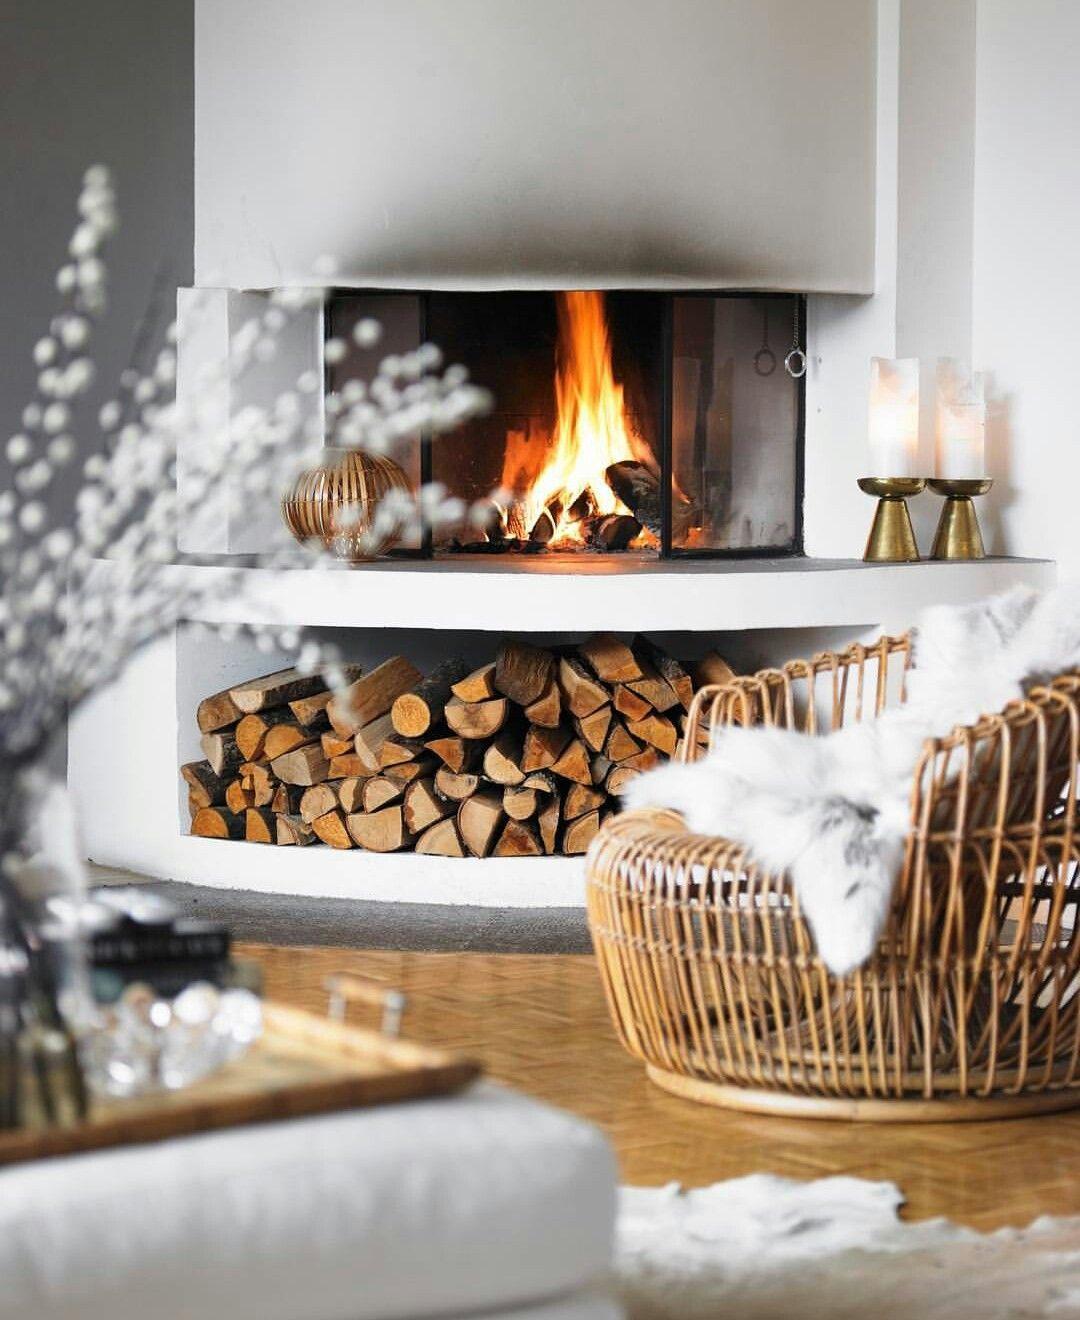 Super cozy   Cozy fireplace, Christmas fireplace decor ...